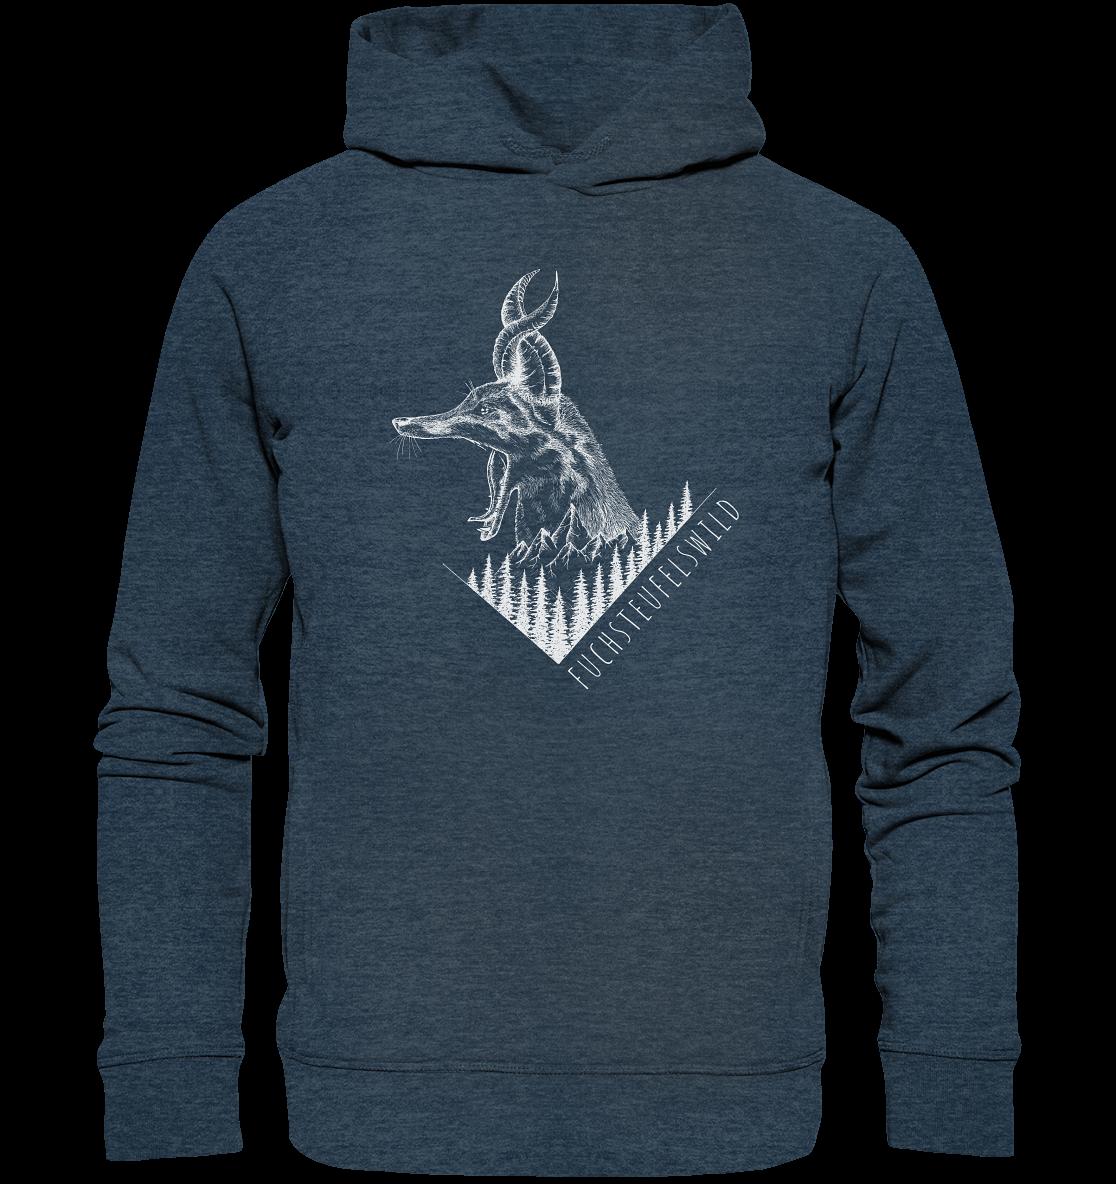 front-organic-fashion-hoodie-102940-1116x-3.png